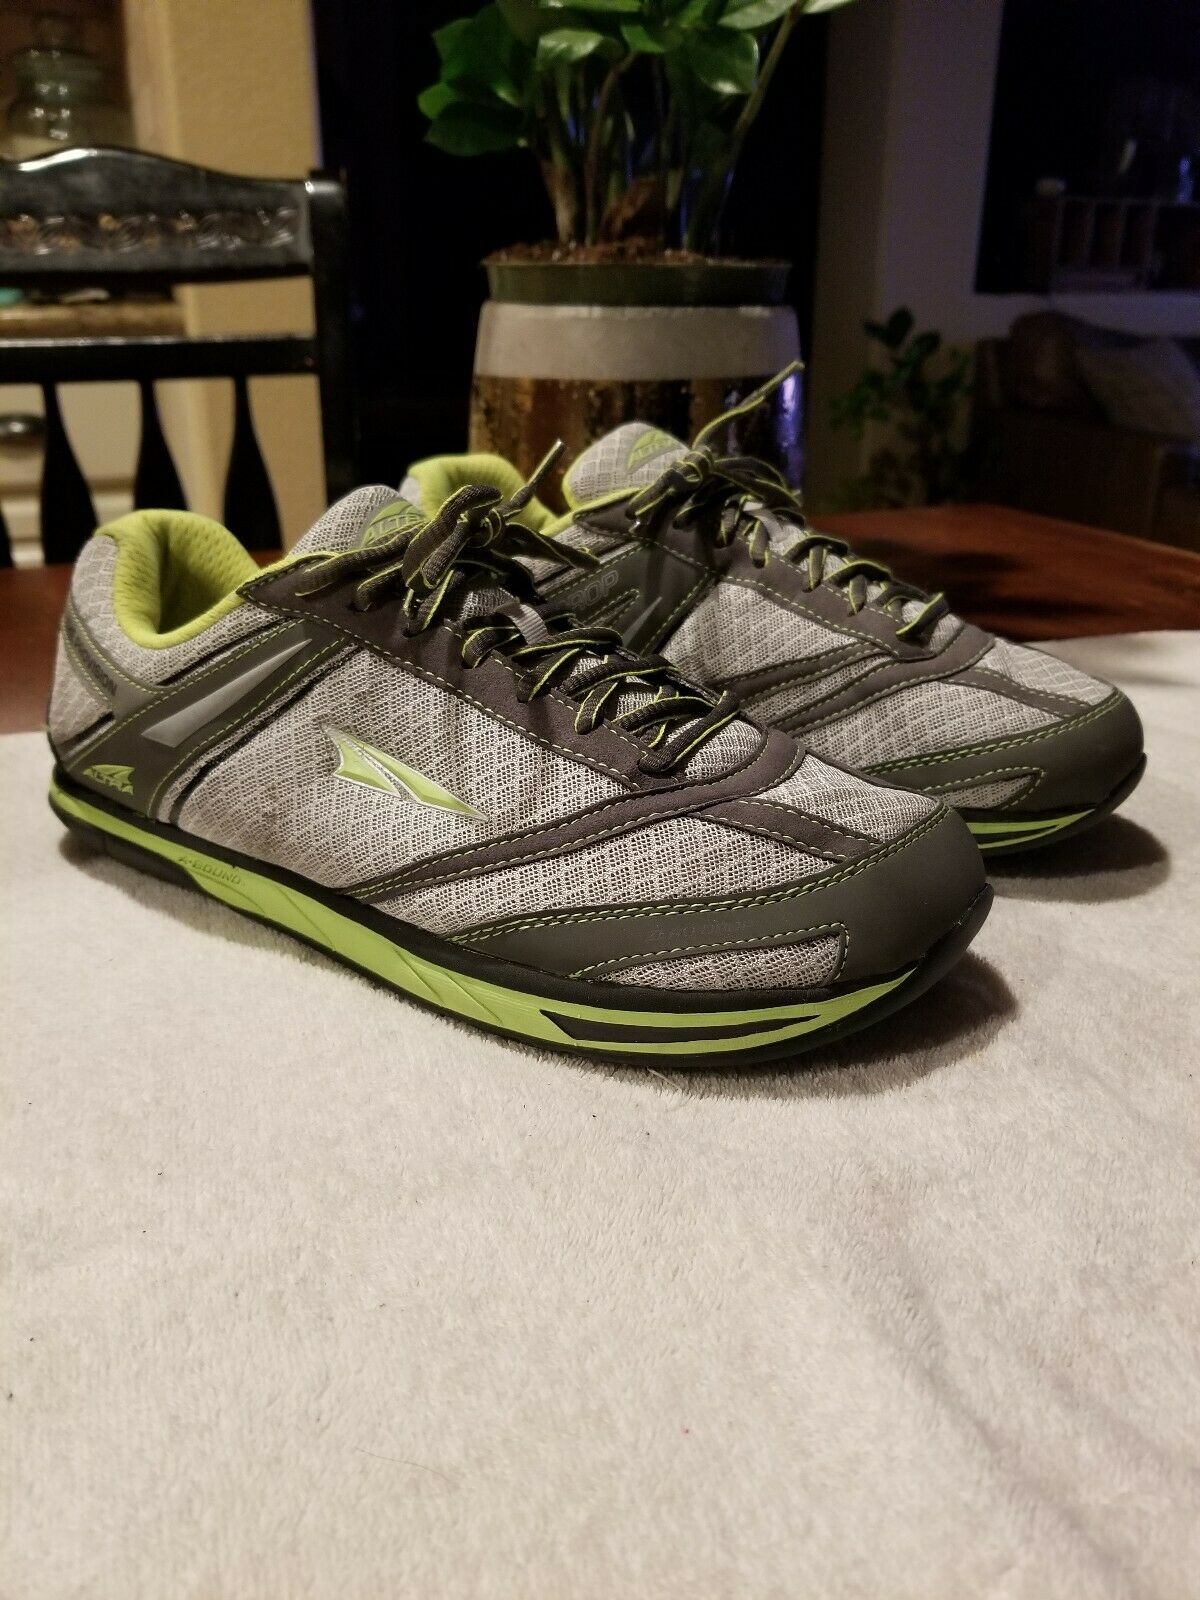 Altra The Provision Run Natural Zero Drop A1234-3-130 Mens Sz 11.5 Running shoes